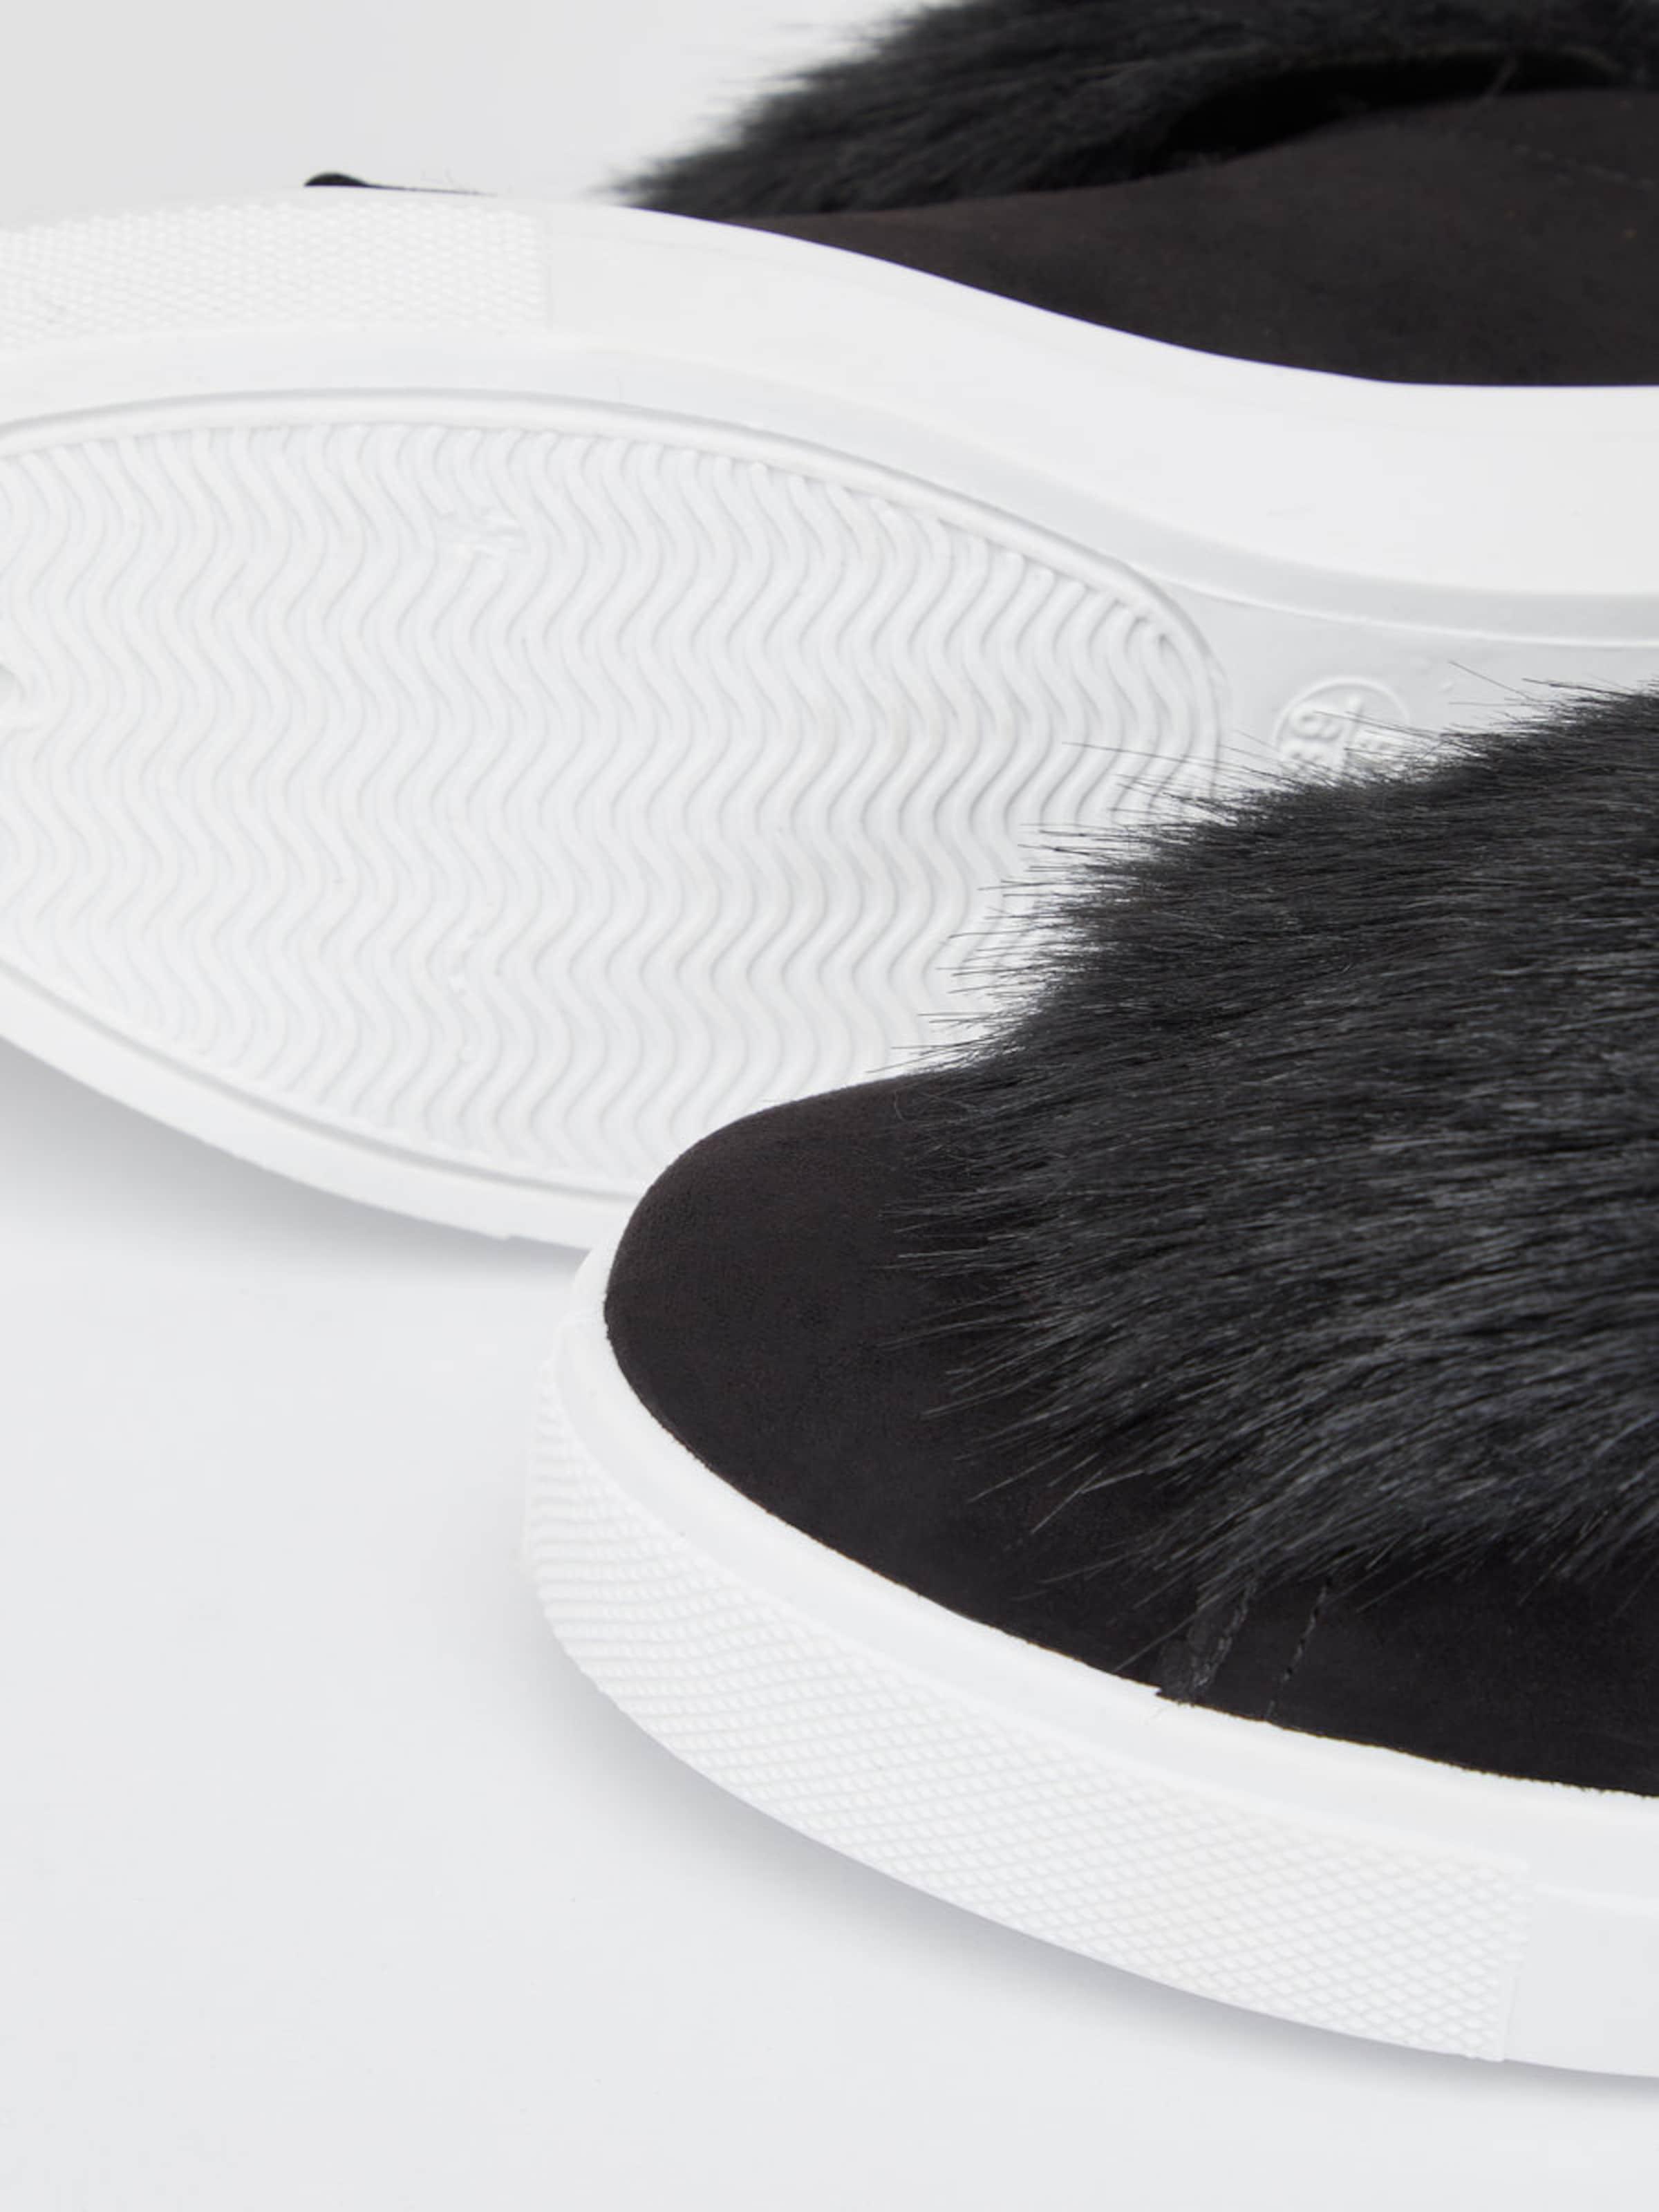 Bianco Sneaker Fell-Deko Spielraum Günstig Online Echt Rabatt Browse djFnK416bo